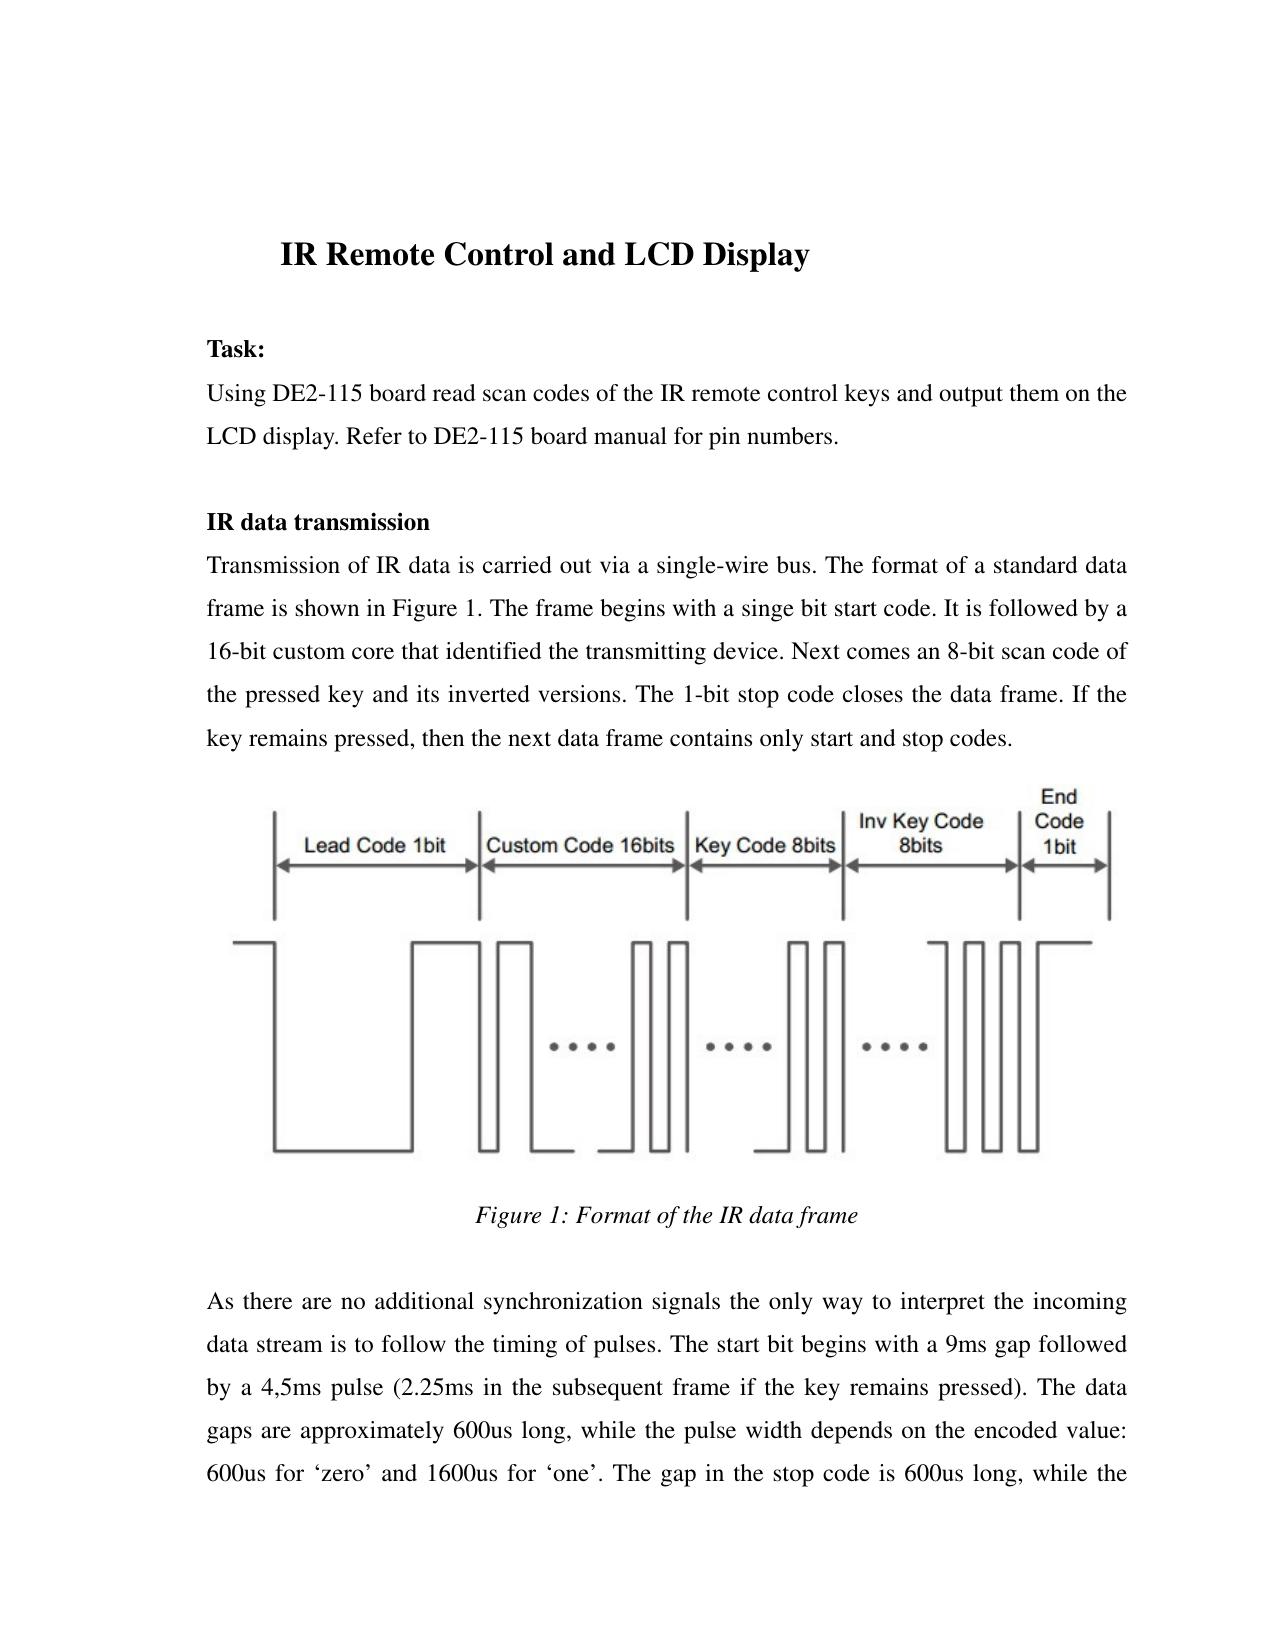 IR Remote Control and LCD Display | manualzz com